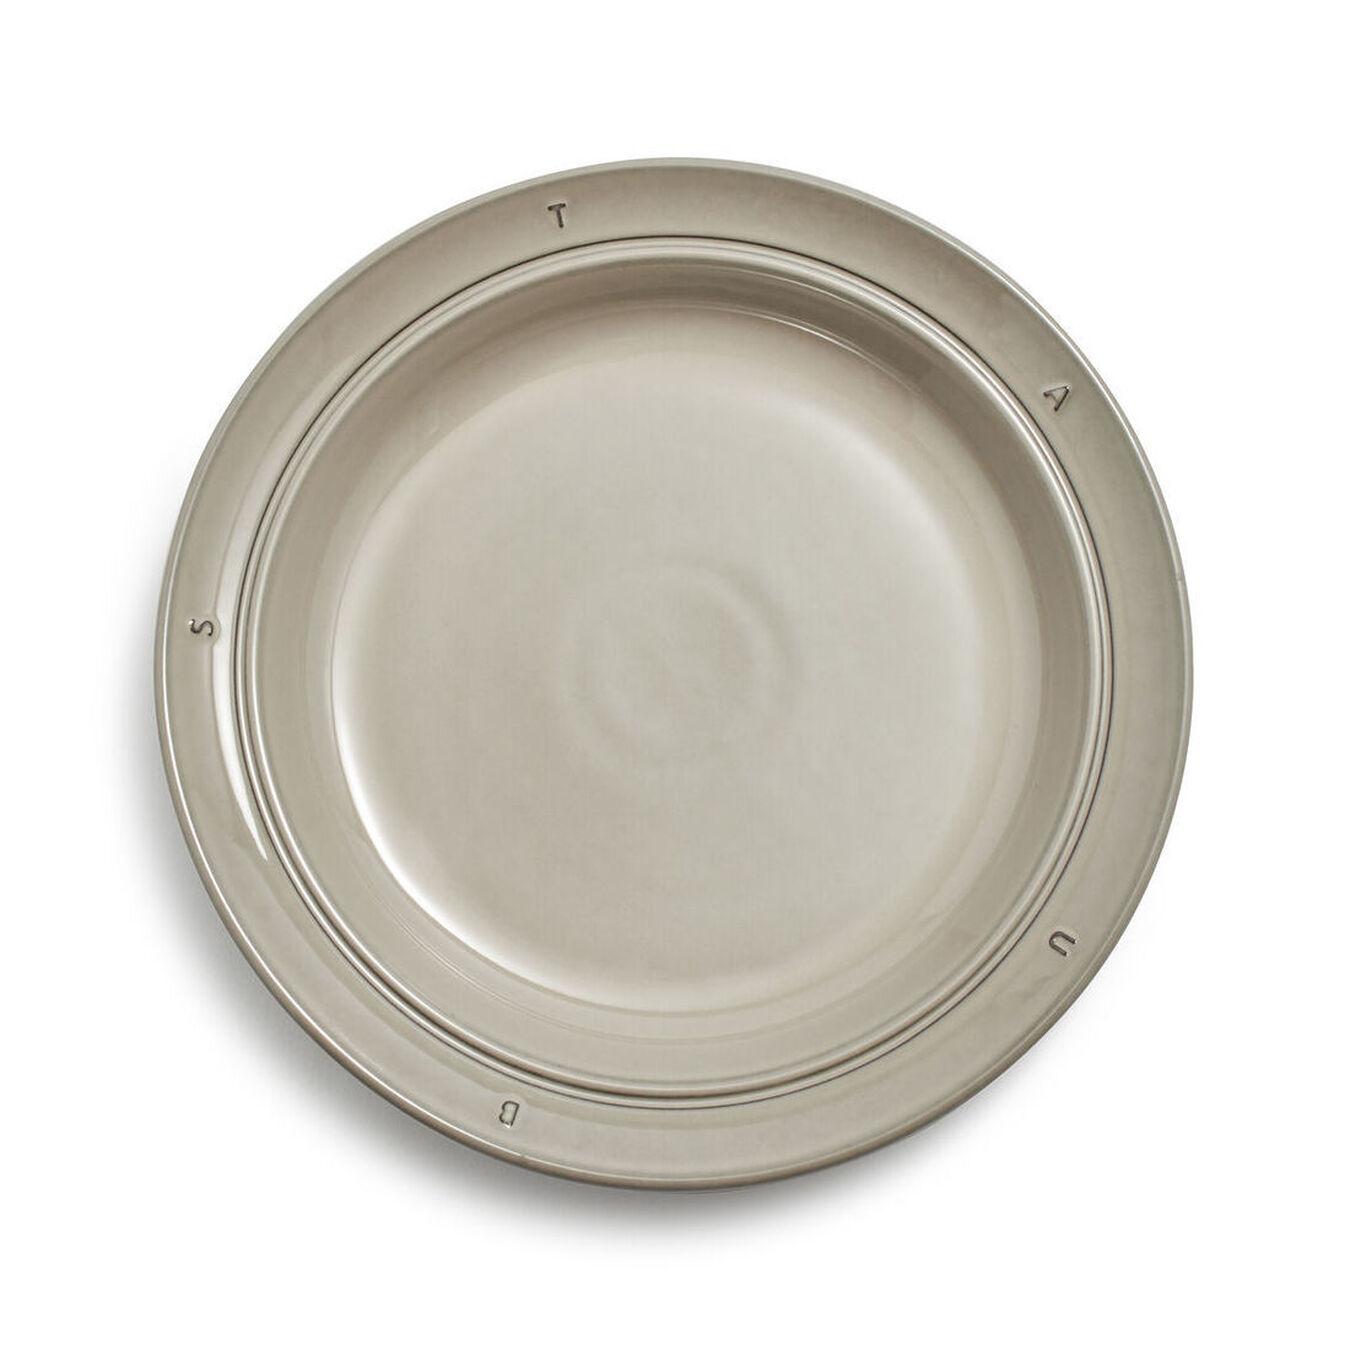 12-pc Dinnerware Set,,large 3